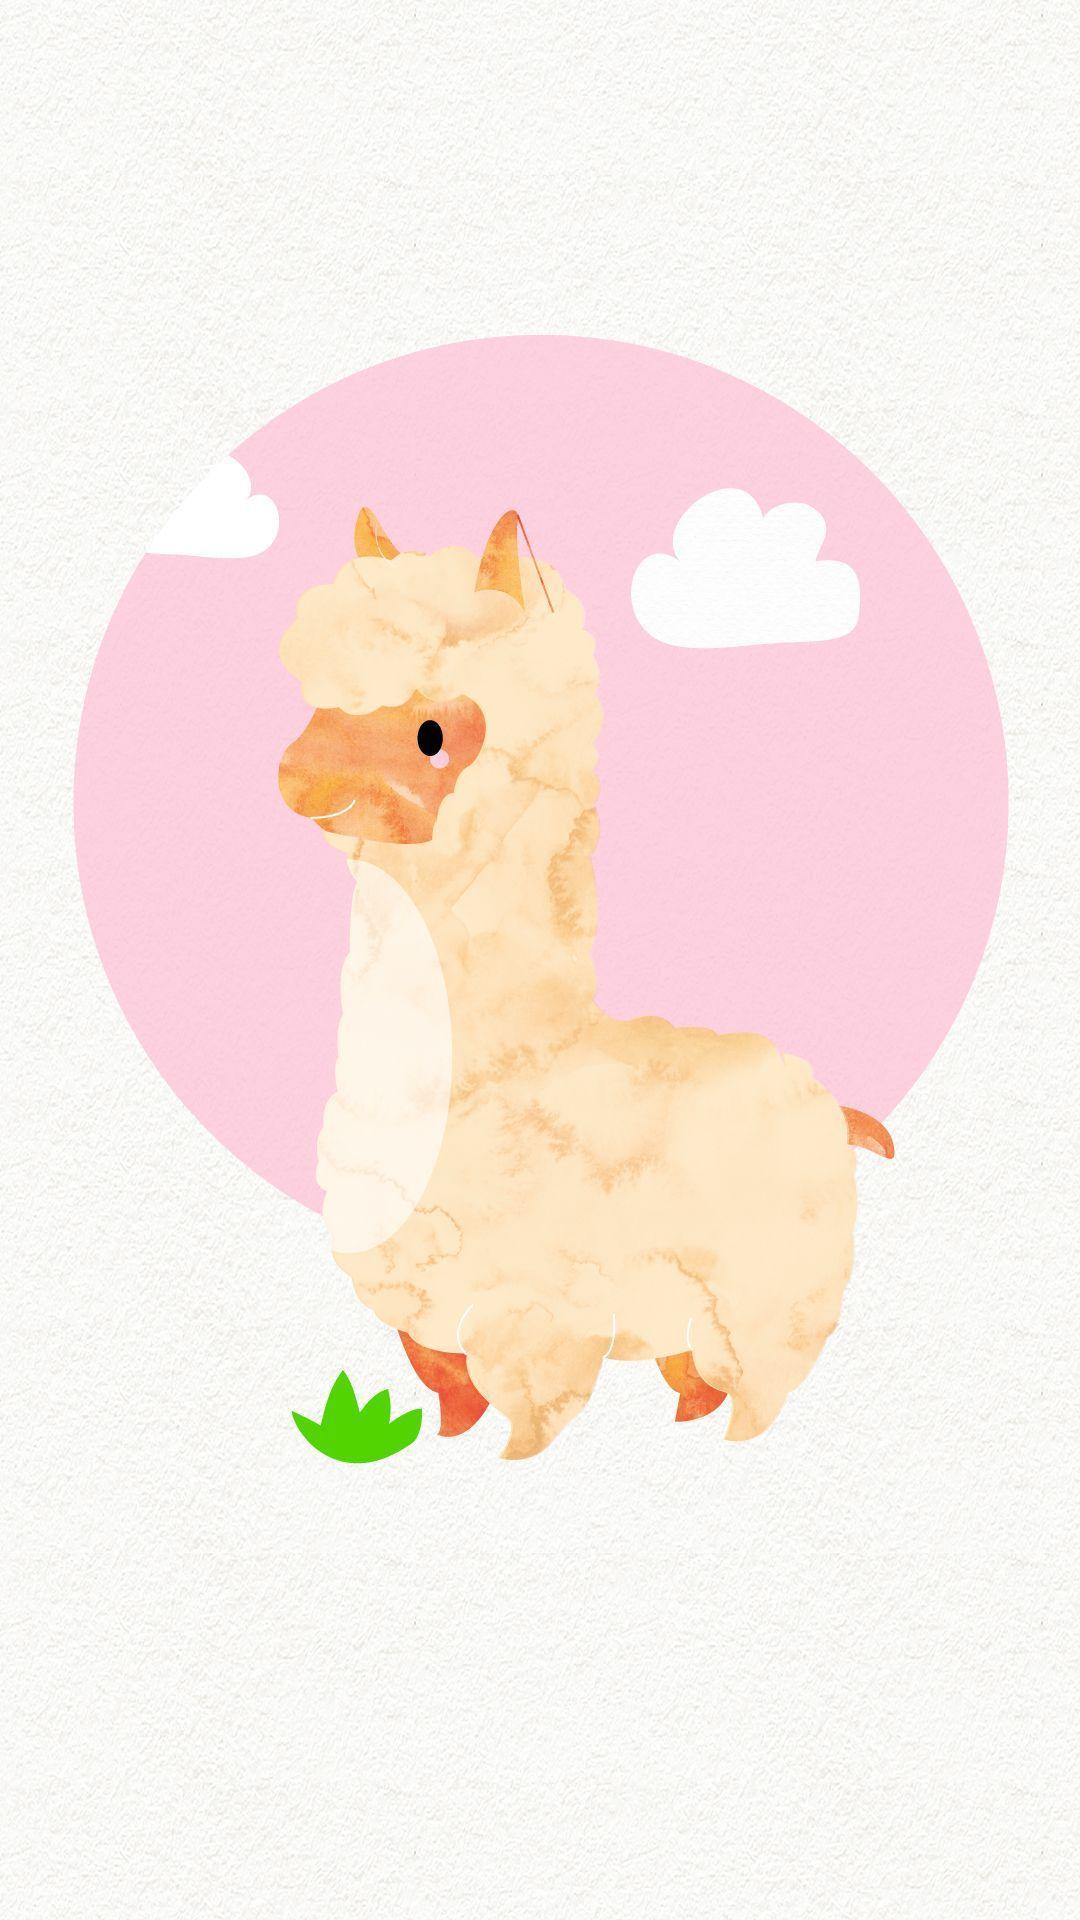 Llama Iphone Wallpapers Top Free Llama Iphone Backgrounds